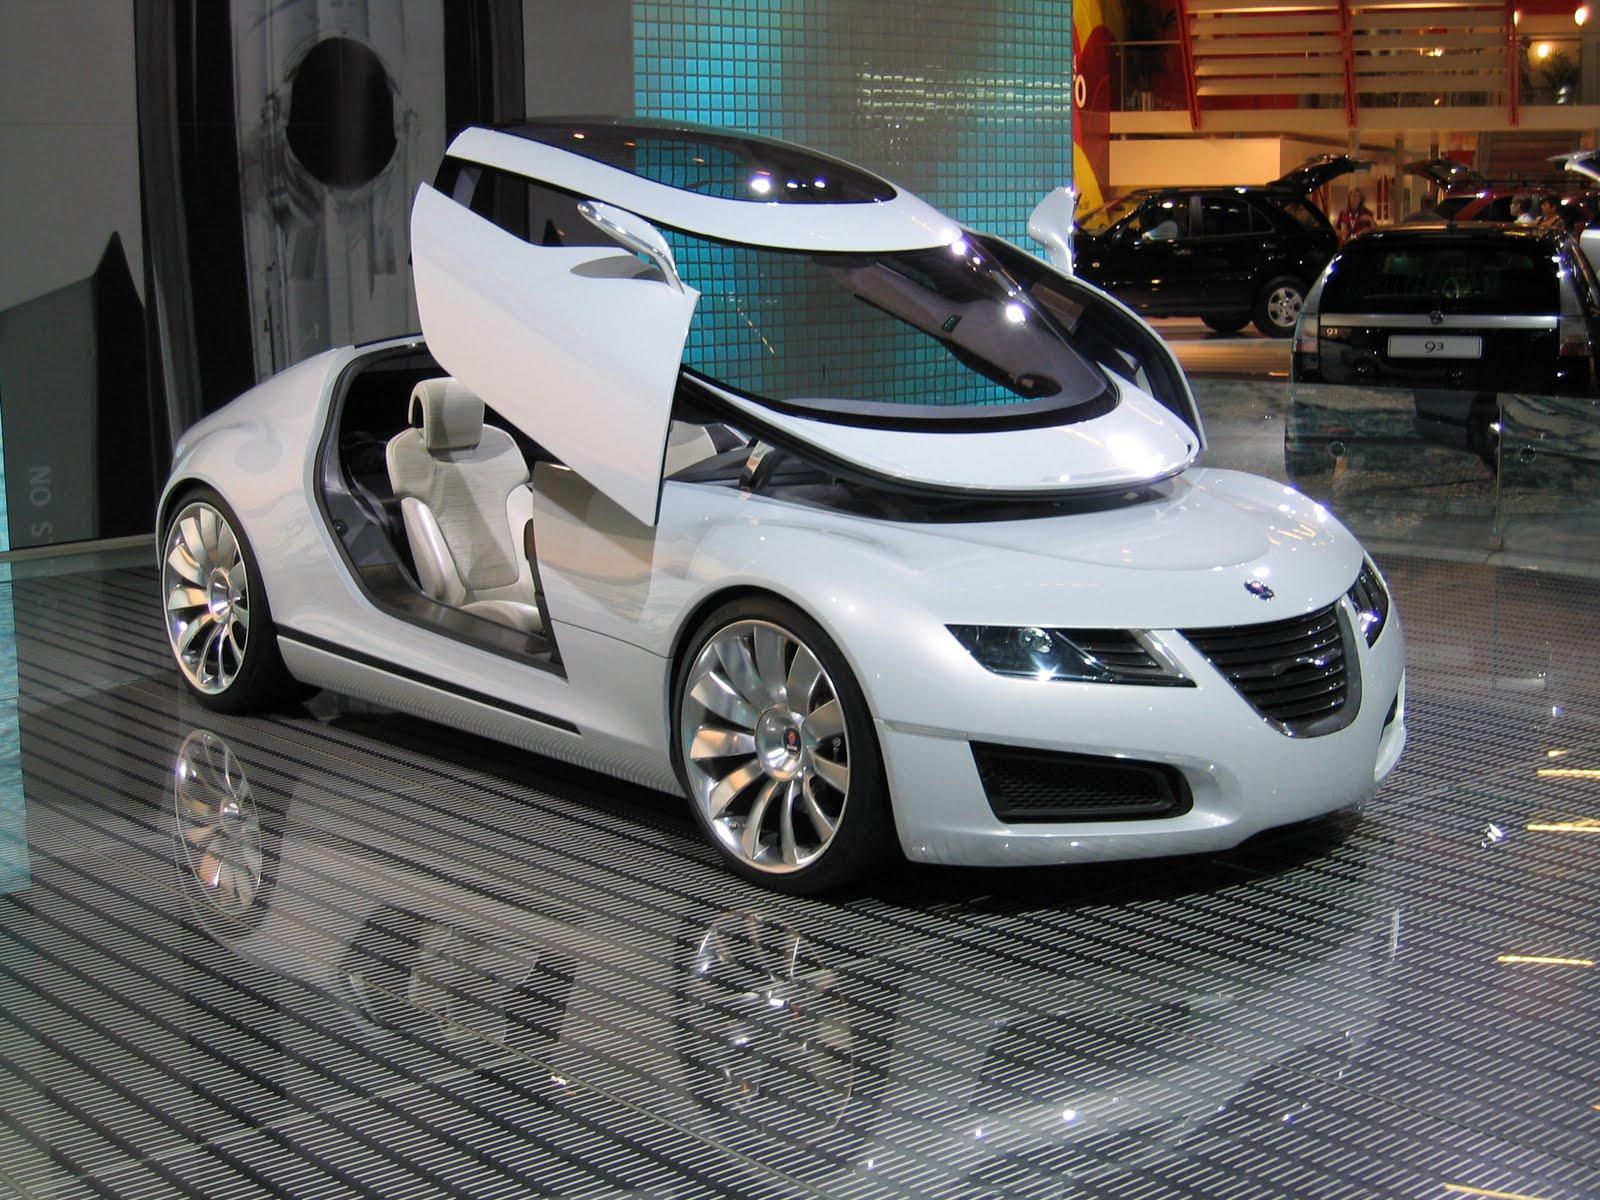 http://1.bp.blogspot.com/-894qRMnCT98/TjpCjEP3qNI/AAAAAAAAC9E/BI7jZ46kRUo/s1600/Amazing-Cars-HD-wallpaper-%208.jpg